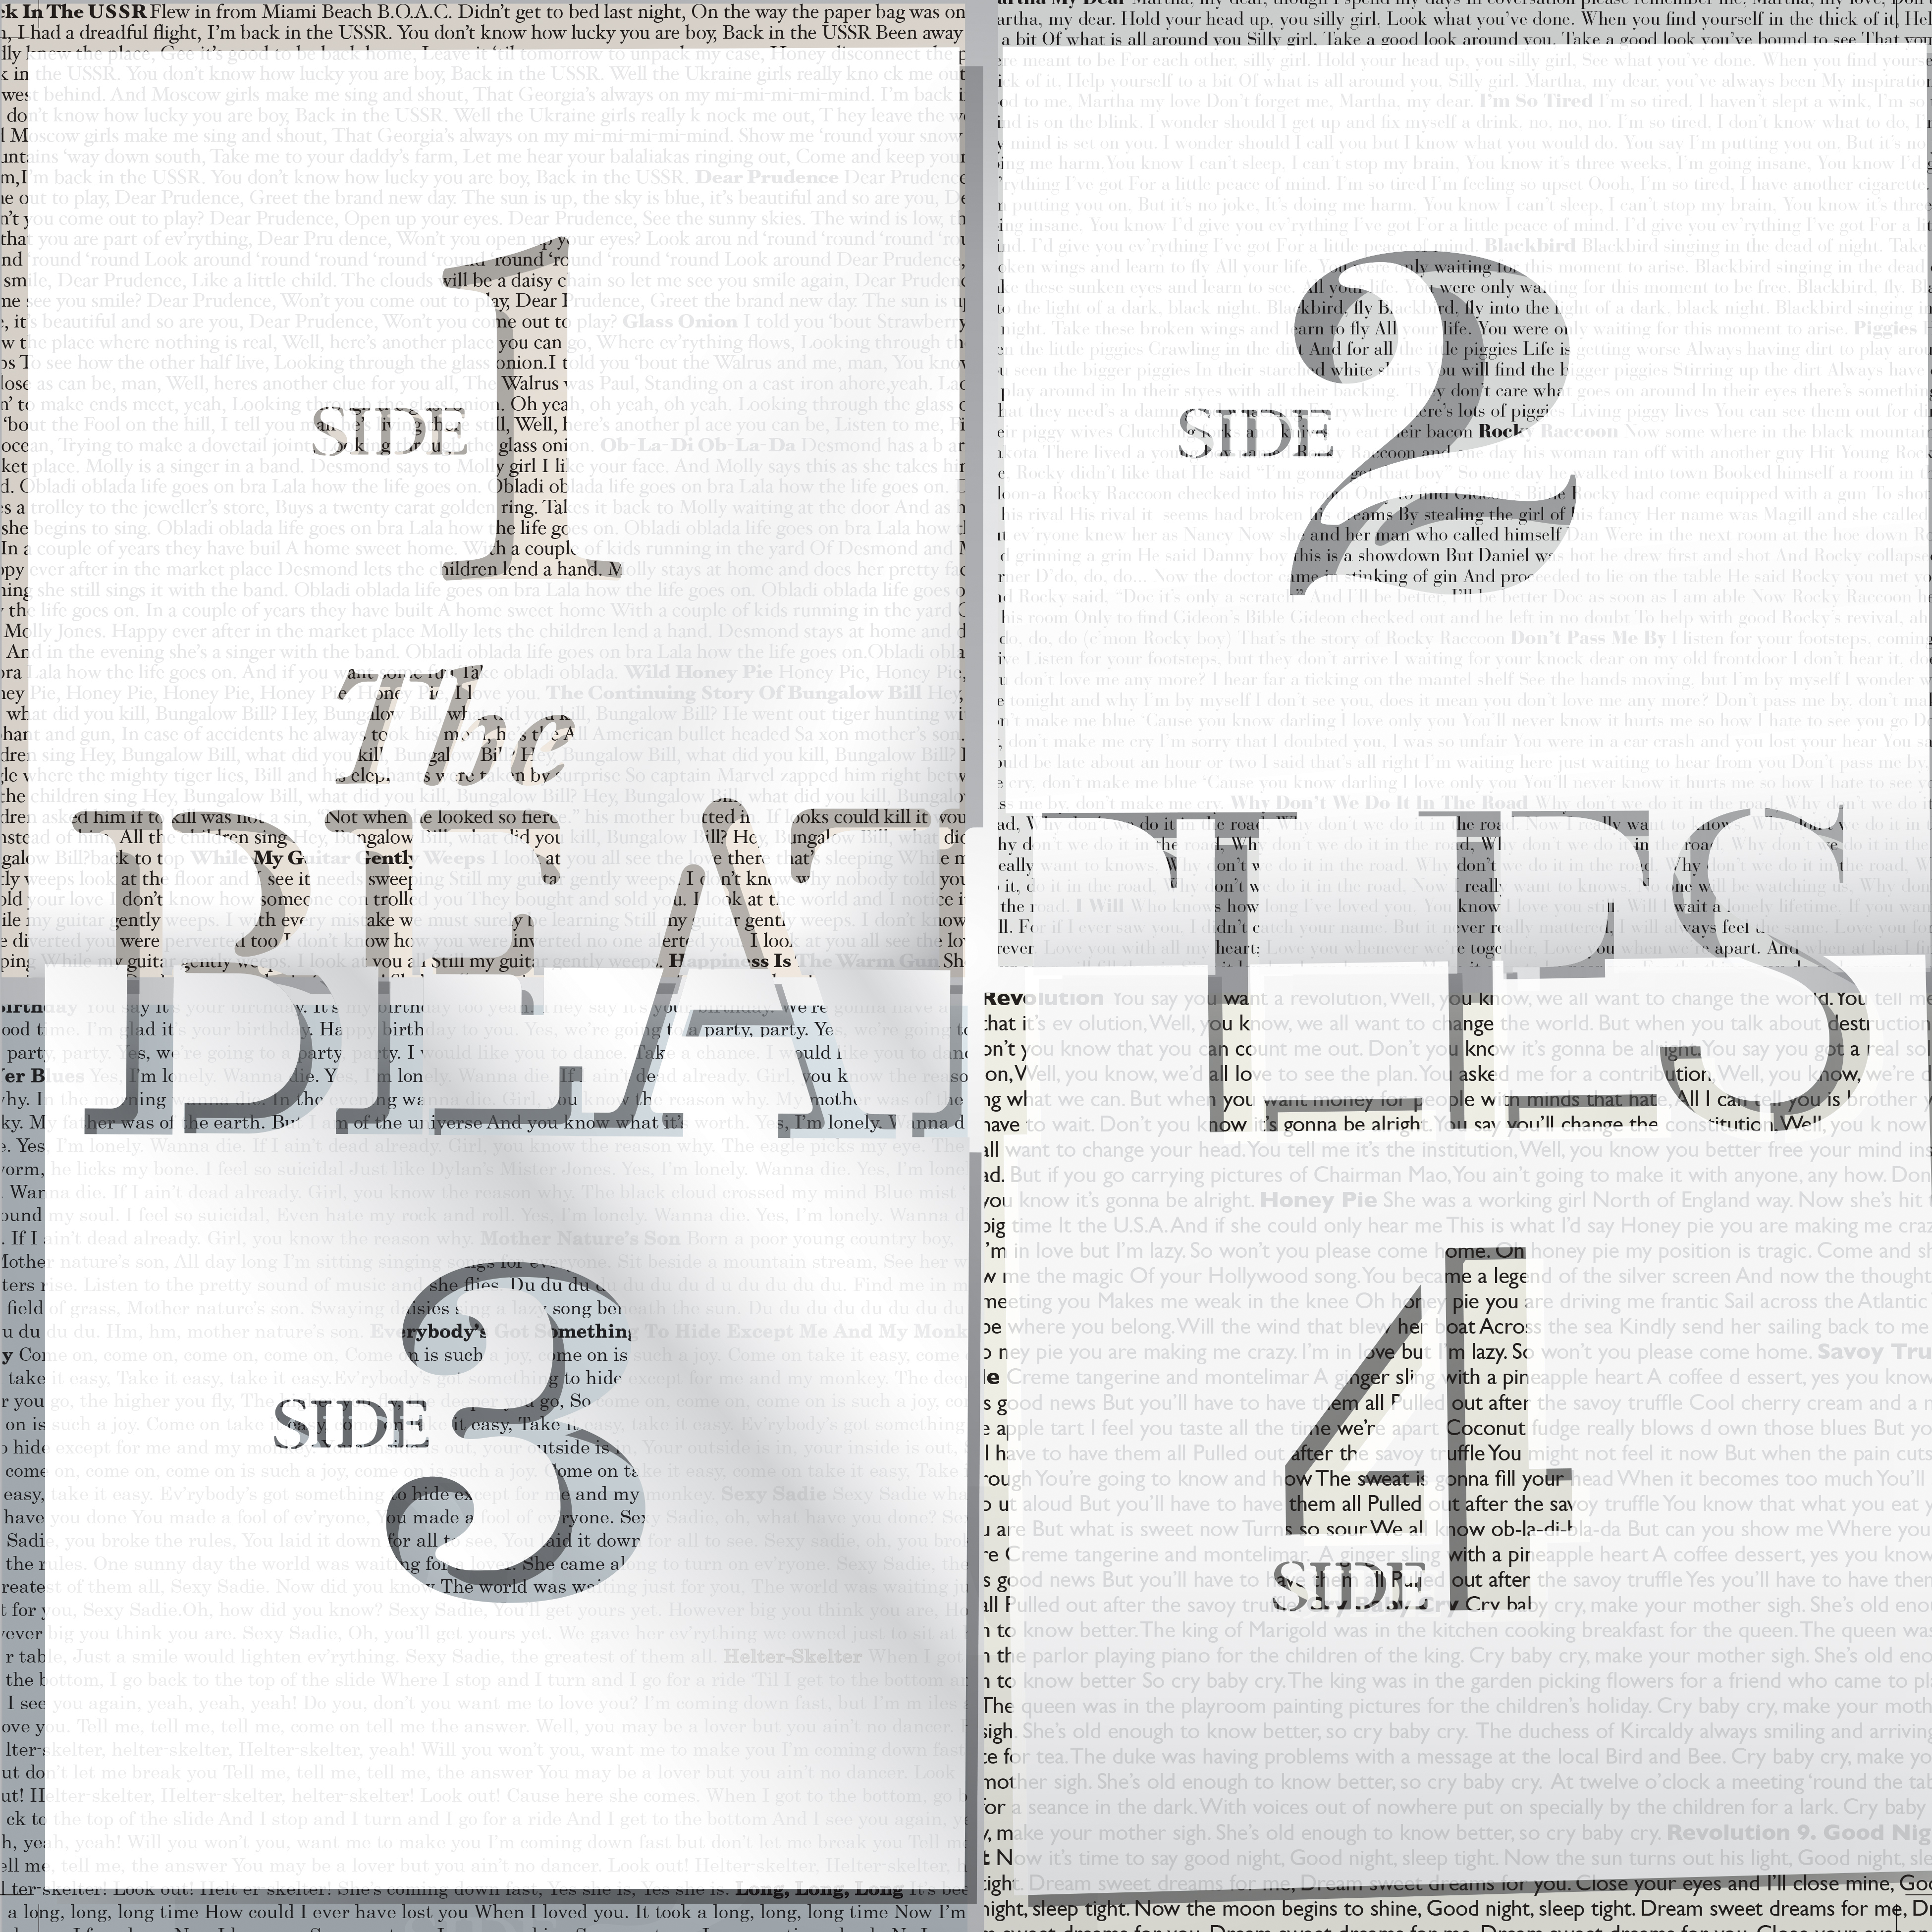 Beatles White Albm 1 BeatlesFinal4